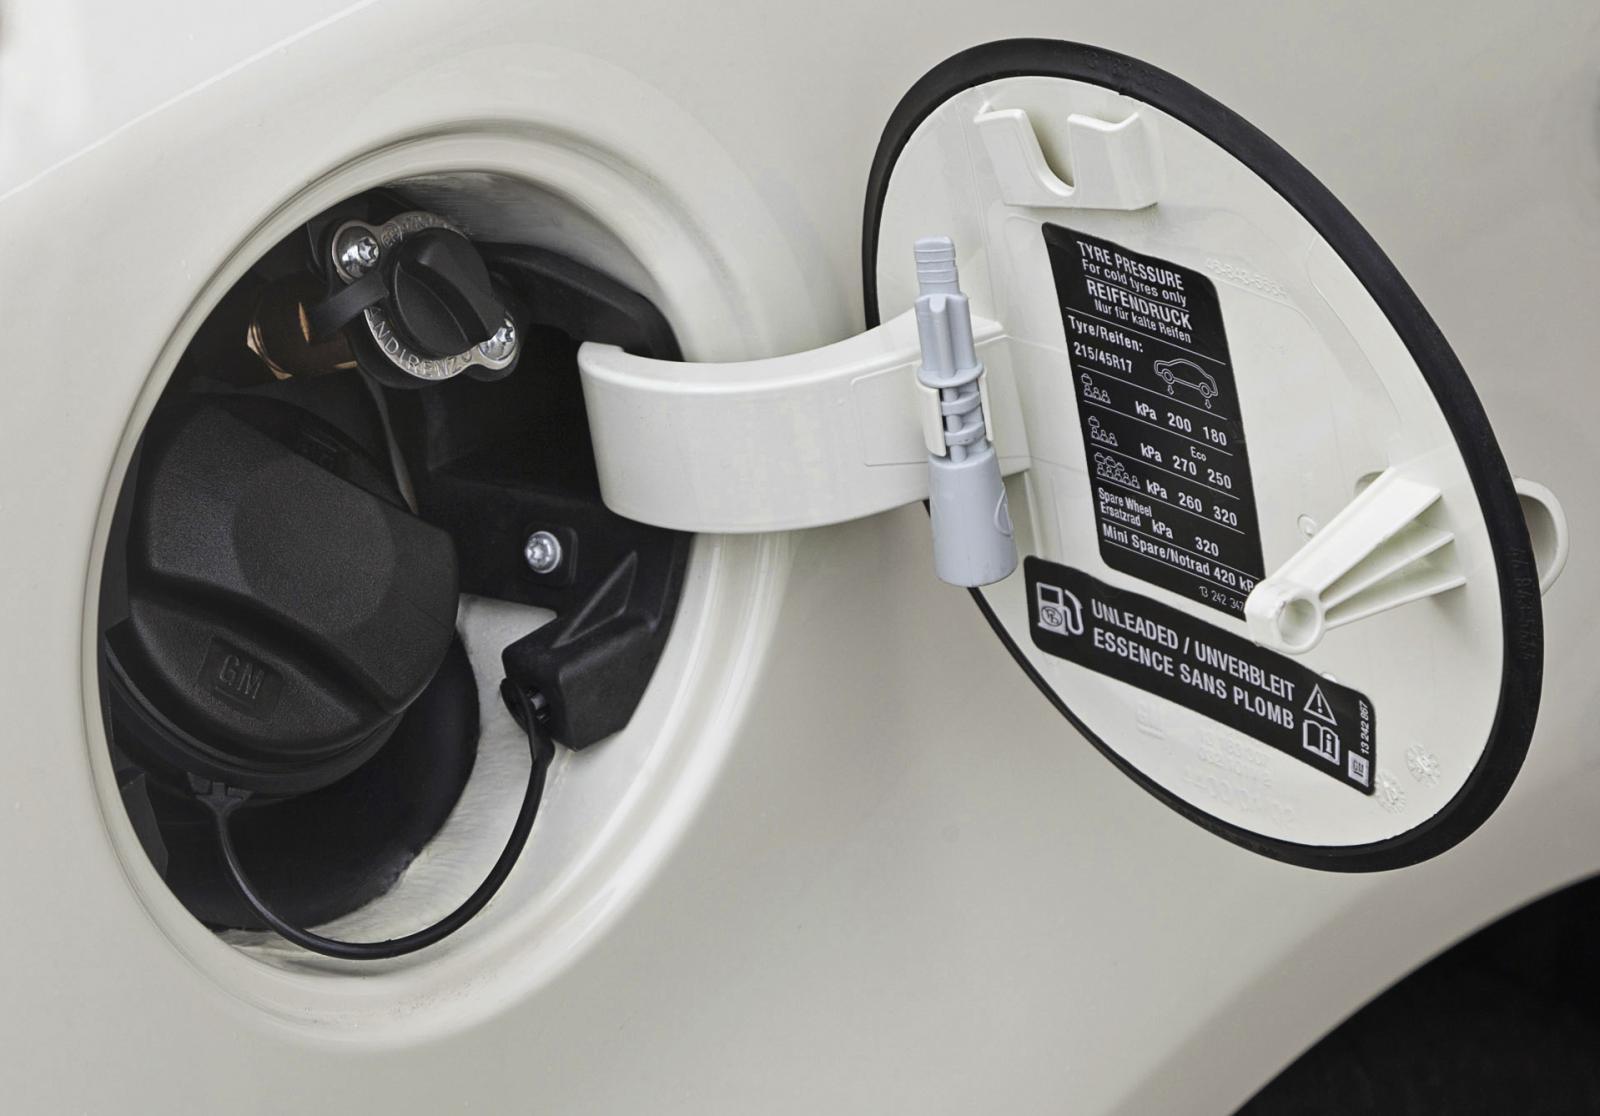 https://gazeo.com/images/gazeo_2015_EN/Automotive/Vehicles/Opel_Corsa_LPG_finally_here/Opel_Corsa_LPG_2015_-_autogas_refueling_valve.jpg